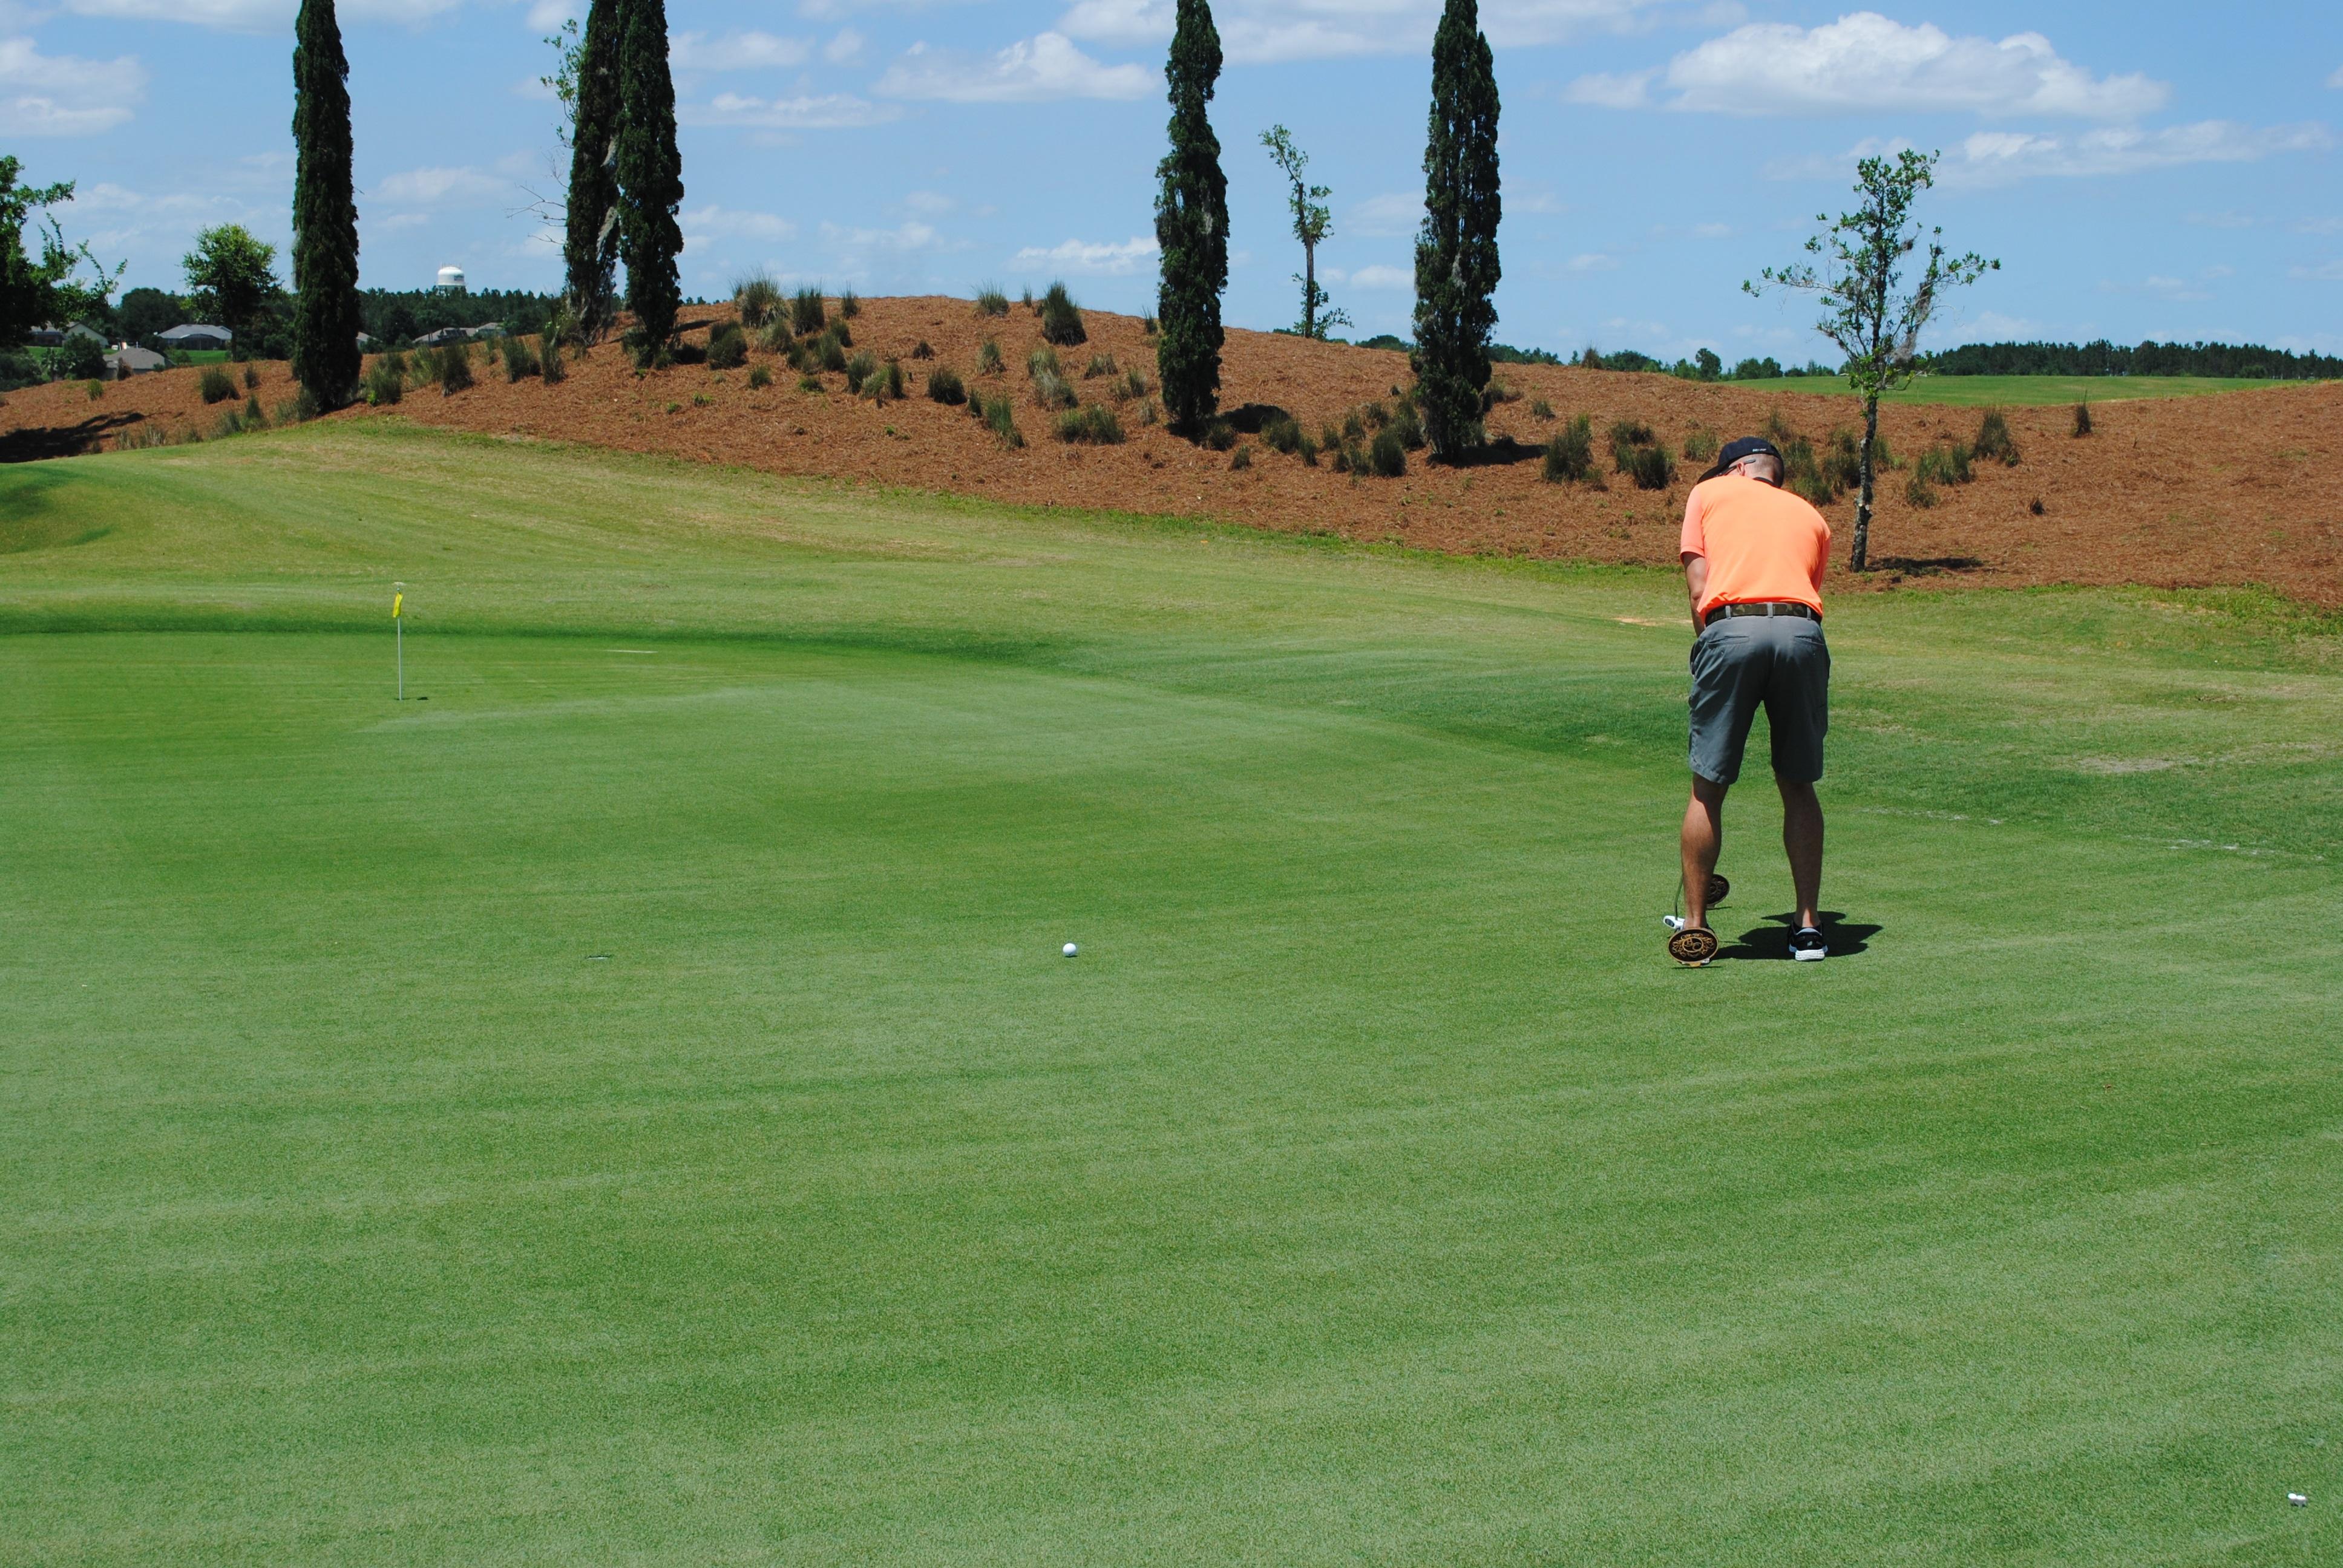 golf 9